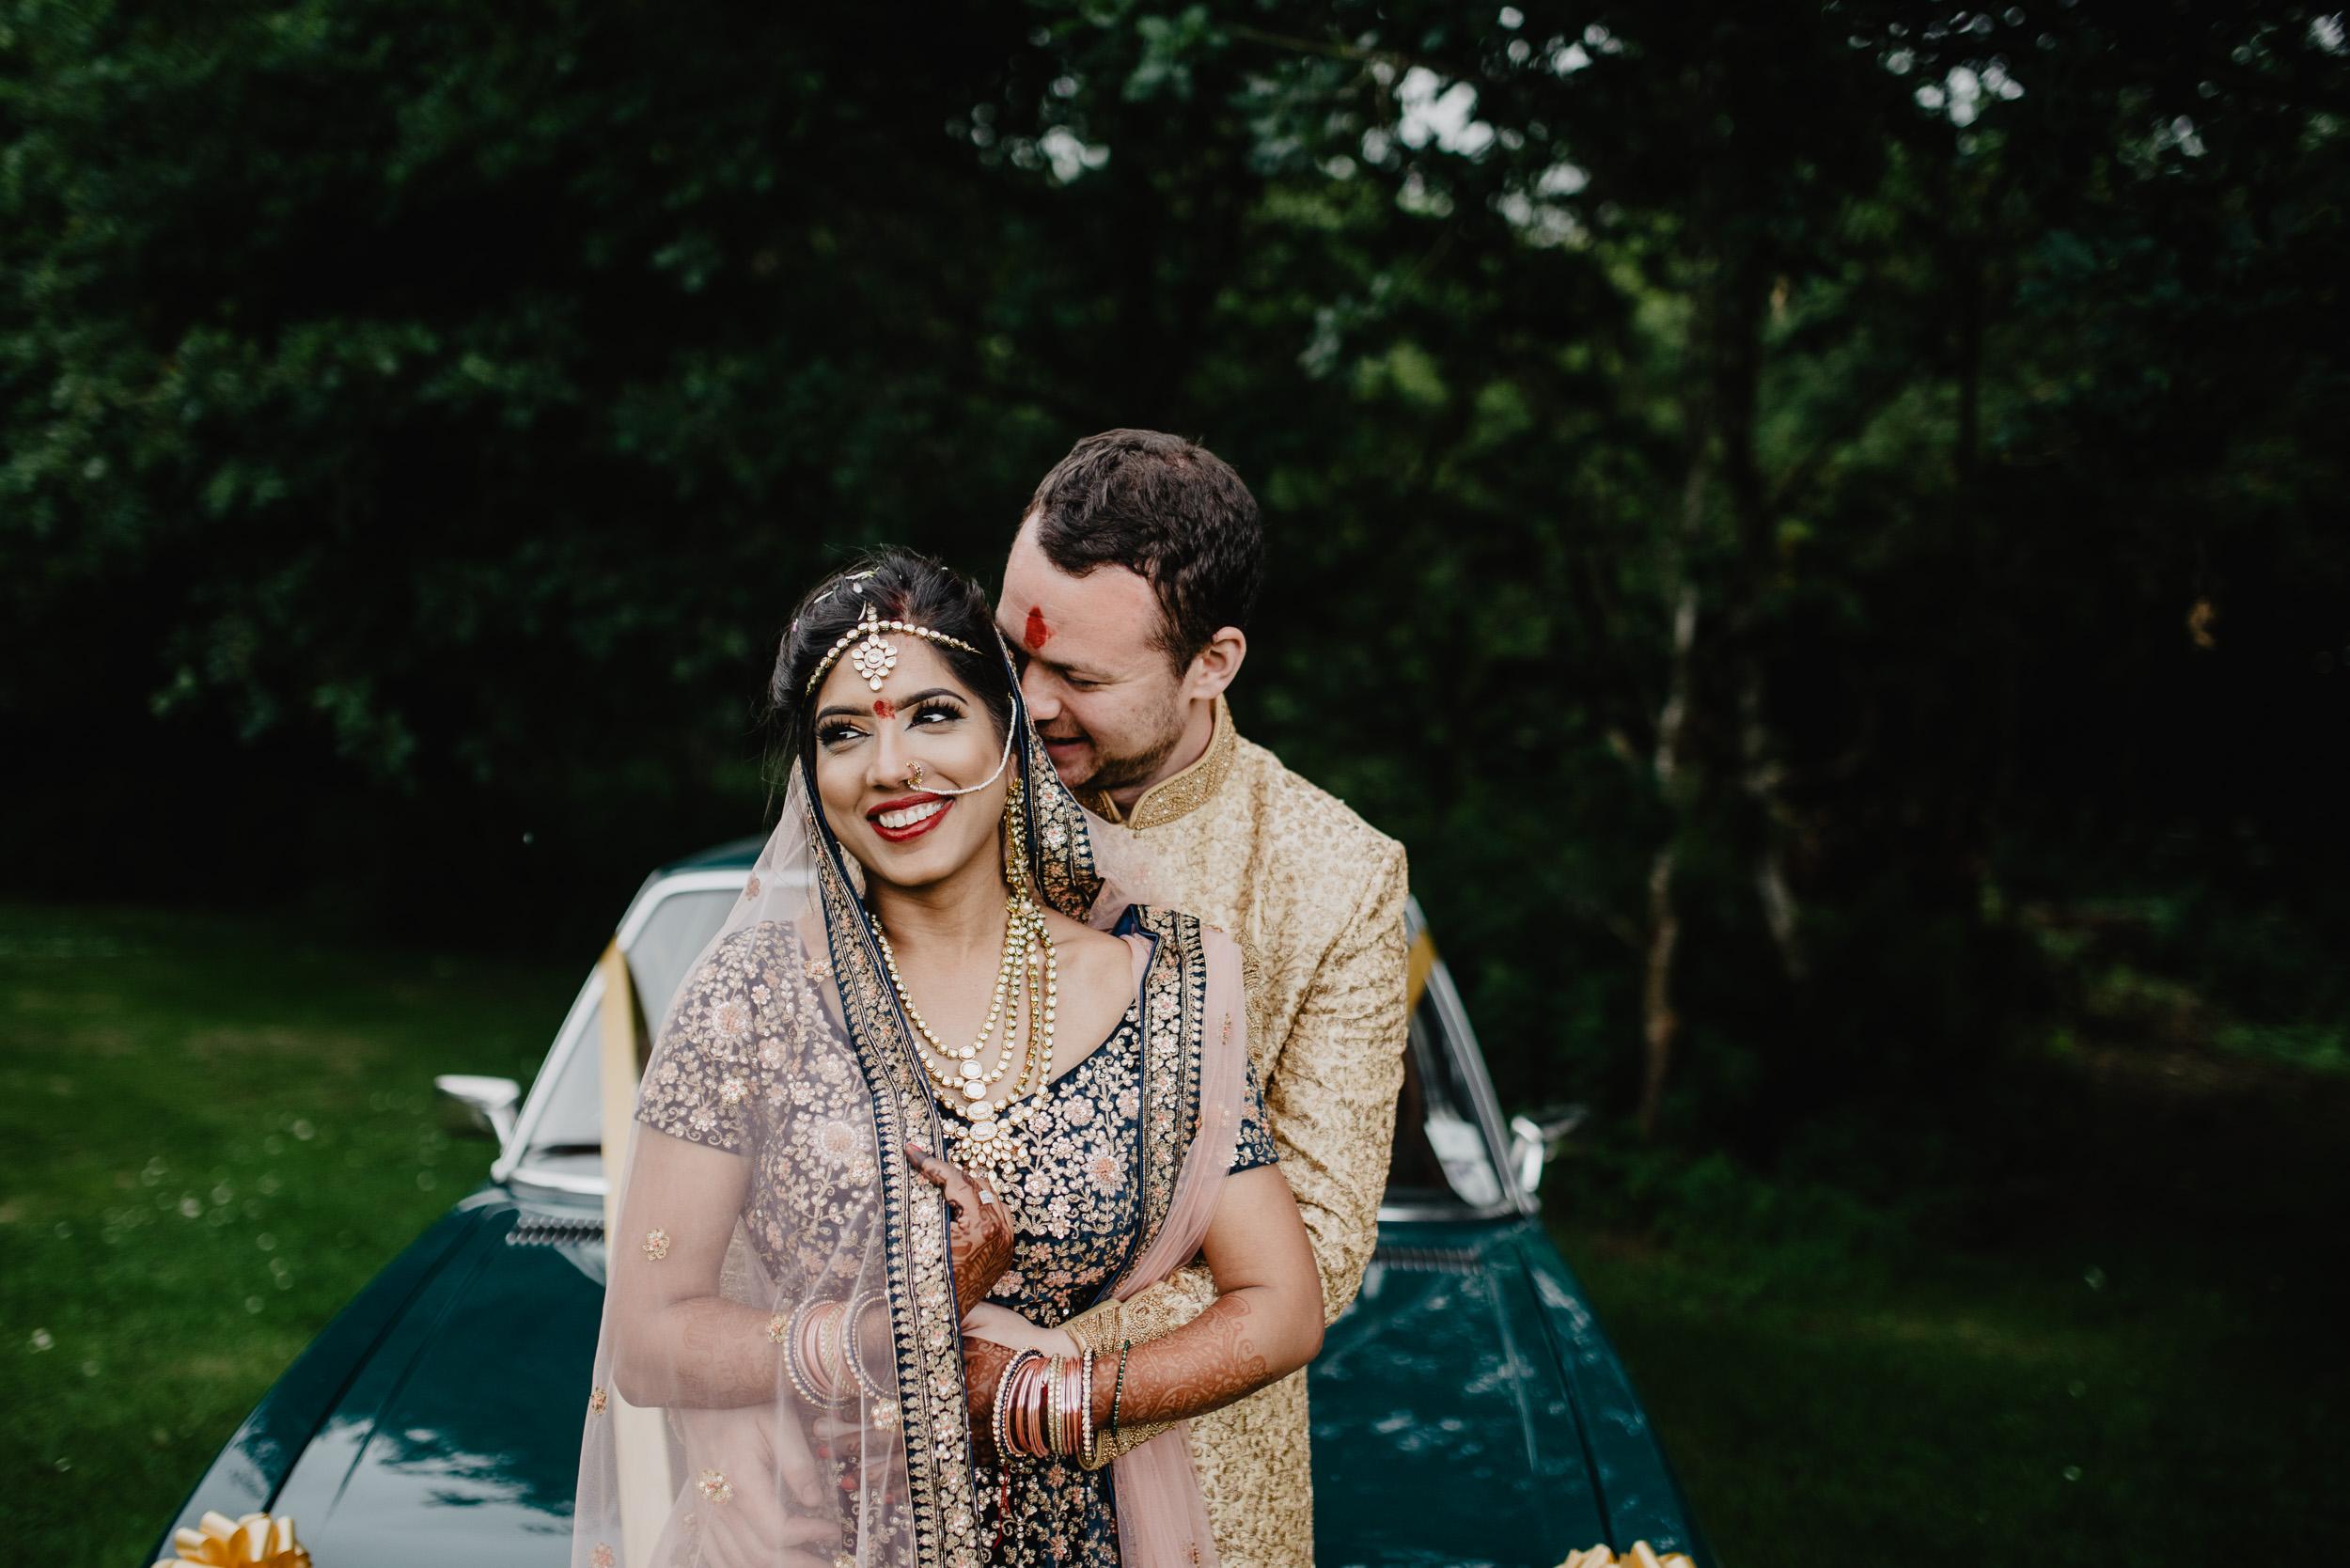 wedding photogaphy peter mackey 2018-10.jpg